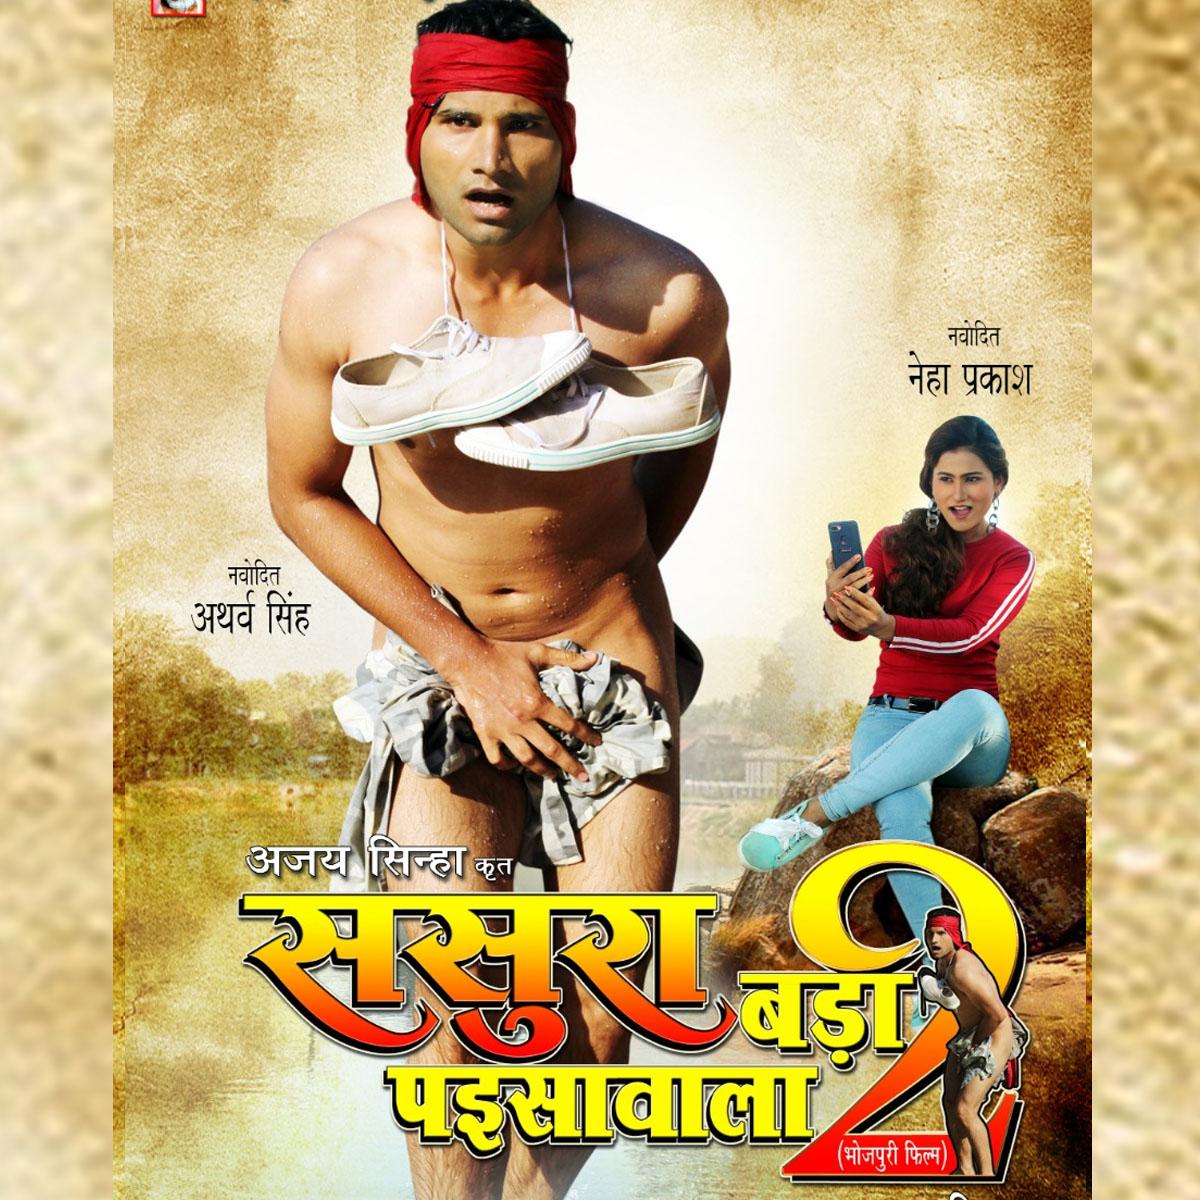 Sasura Bada Paisa wala 2, Bhojpuri Film, Bhojpuri Cinema